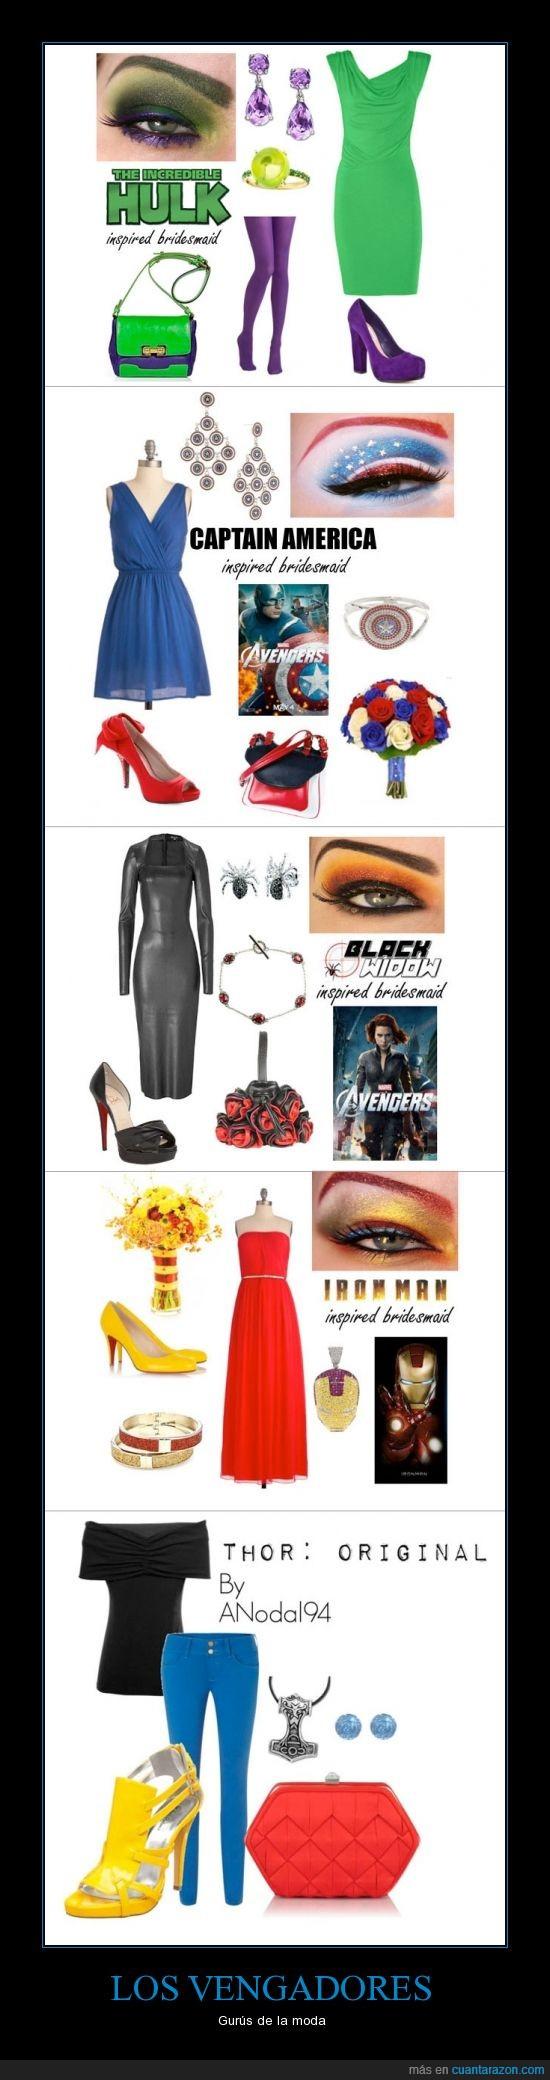 avenger,capitan,chica,conjunto,iron man,ironman,maquillaje,parecer,ropa,thor,vengador,viuda negra